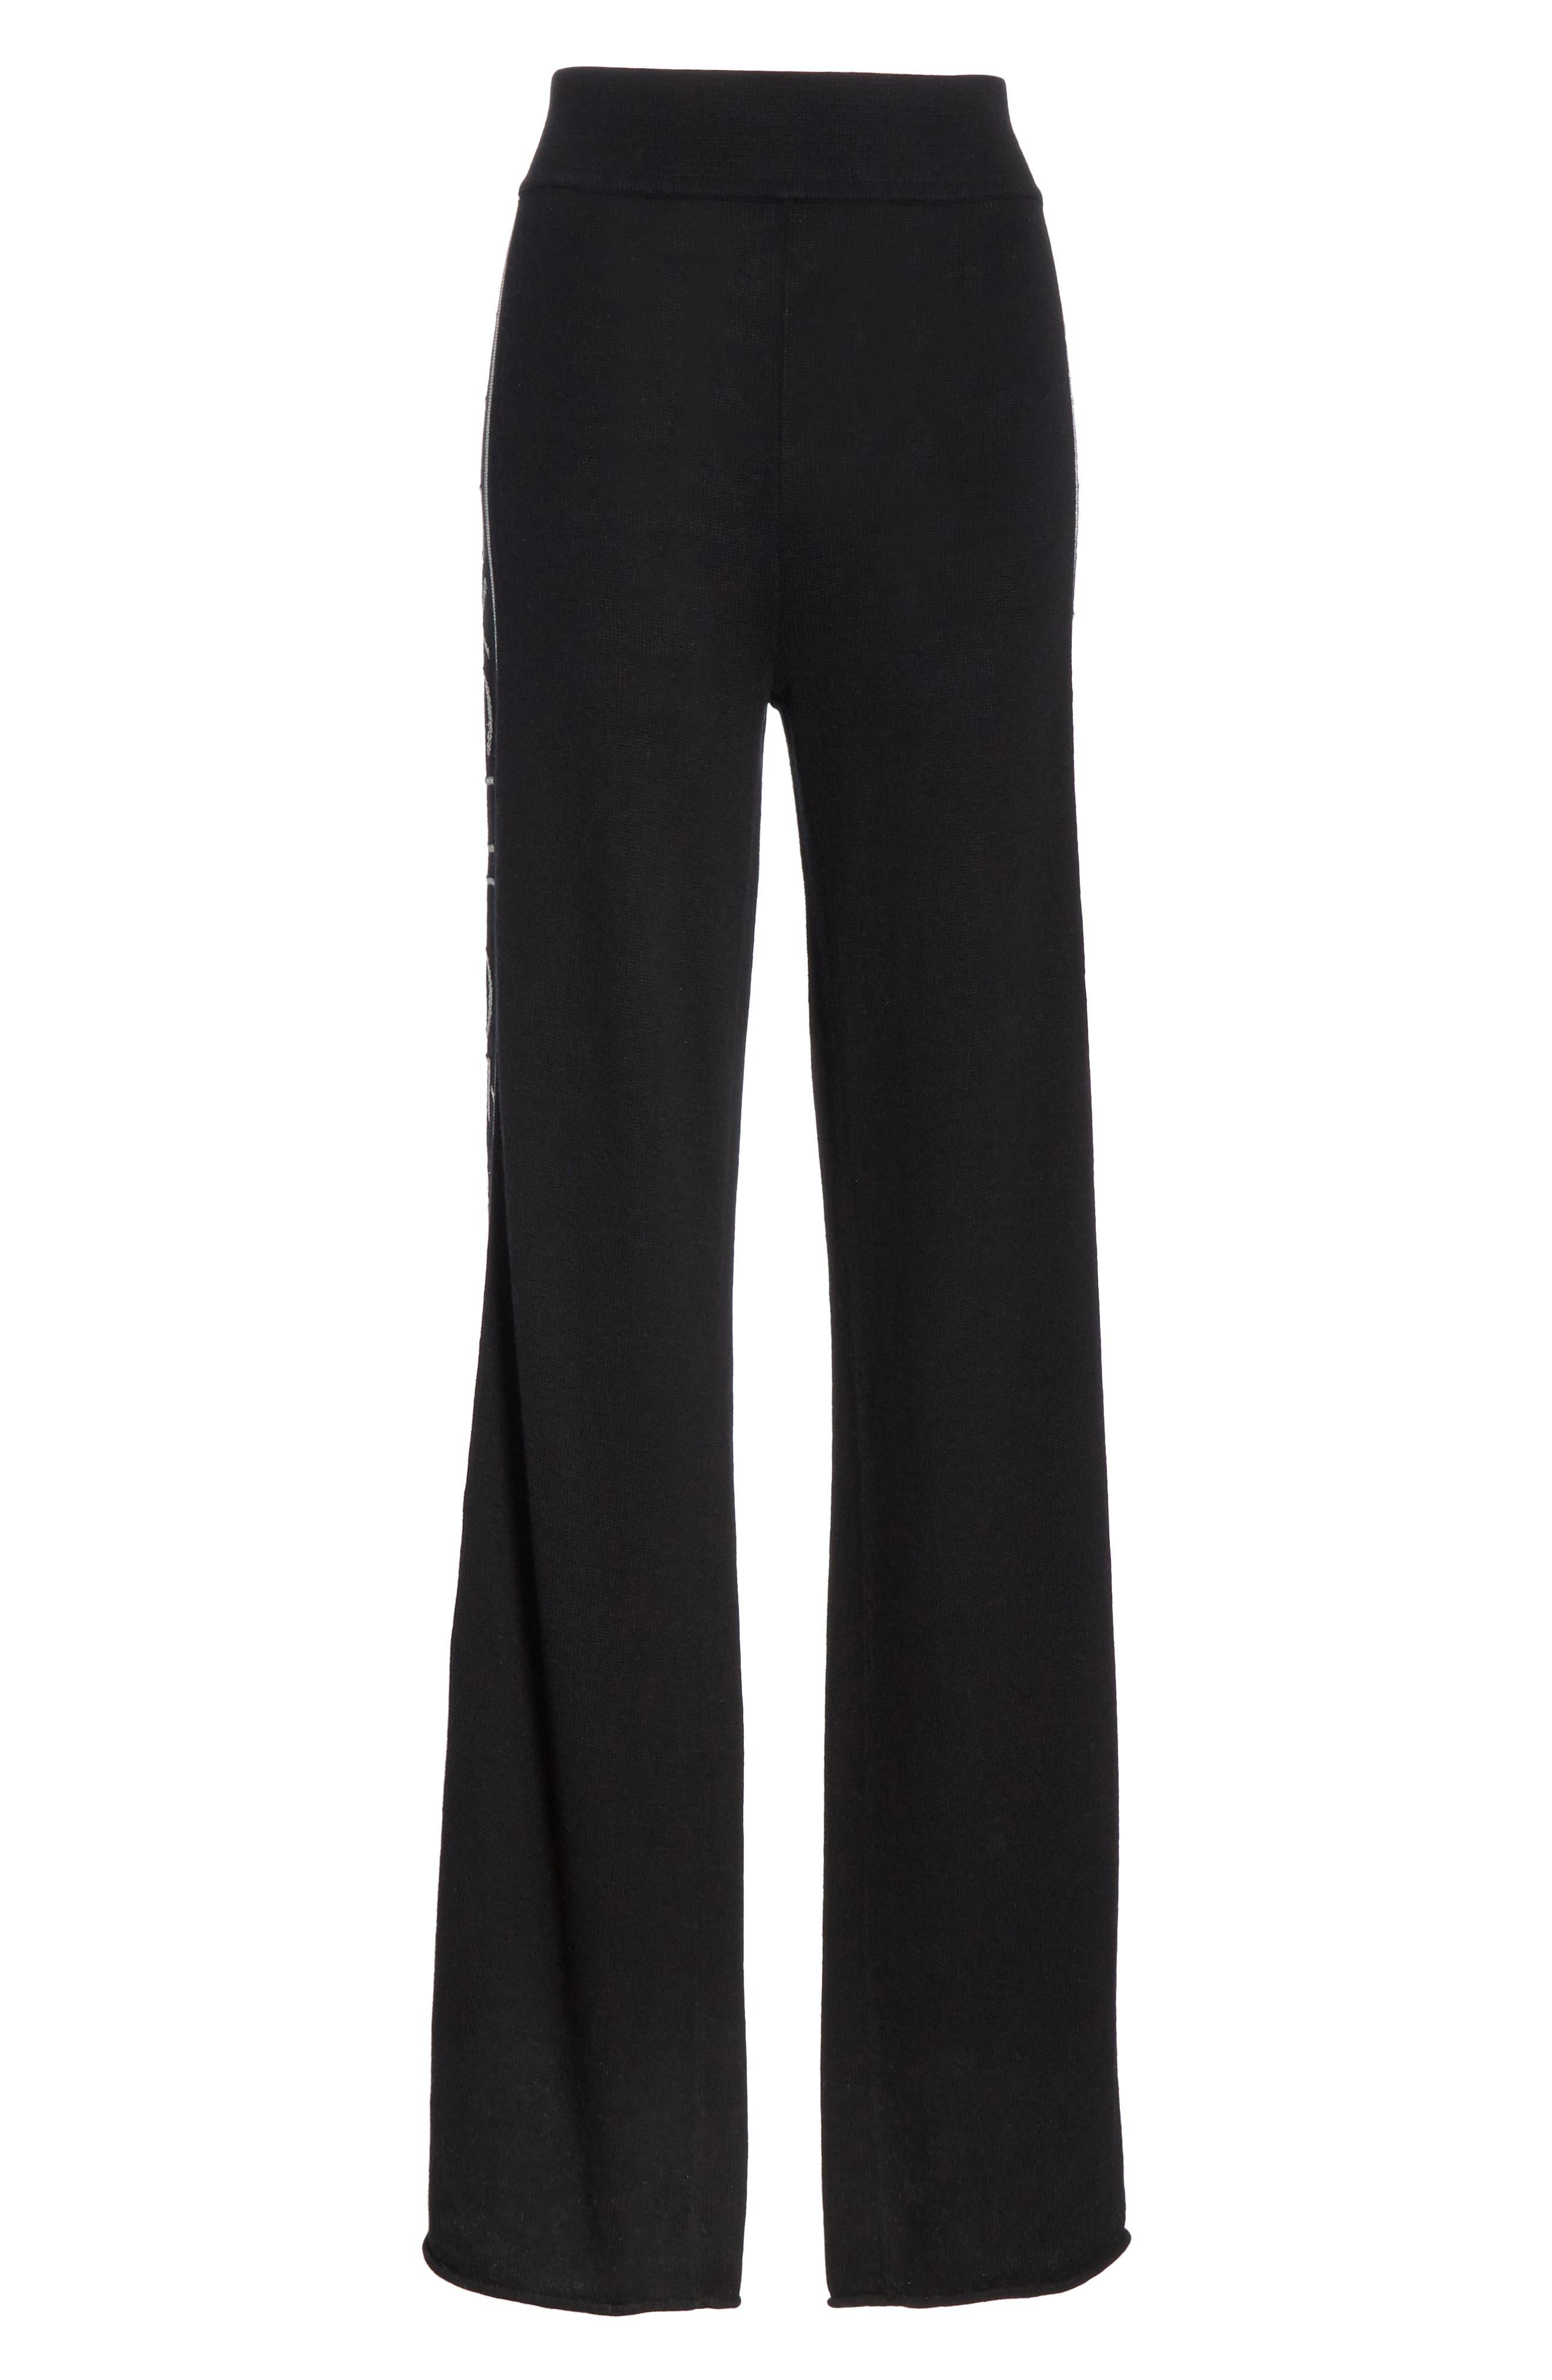 Metallic Knit Wool Blend Trousers,                             Alternate thumbnail 6, color,                             BLACK